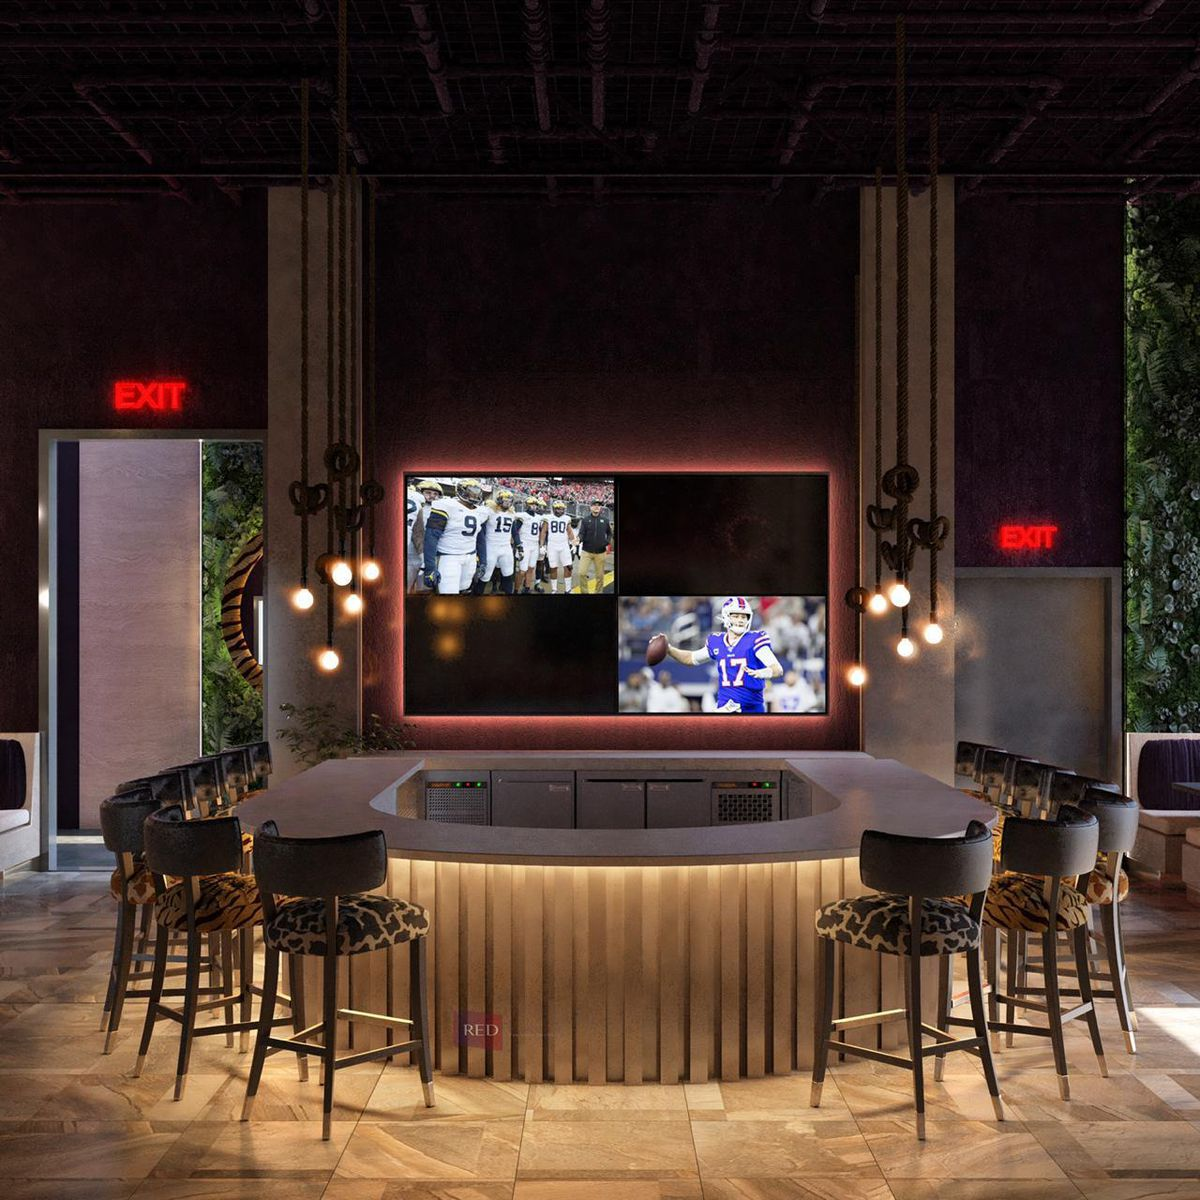 The u-shaped bar at Zoo Bar in Grant park Atlanta with a large LED screen tv playing football